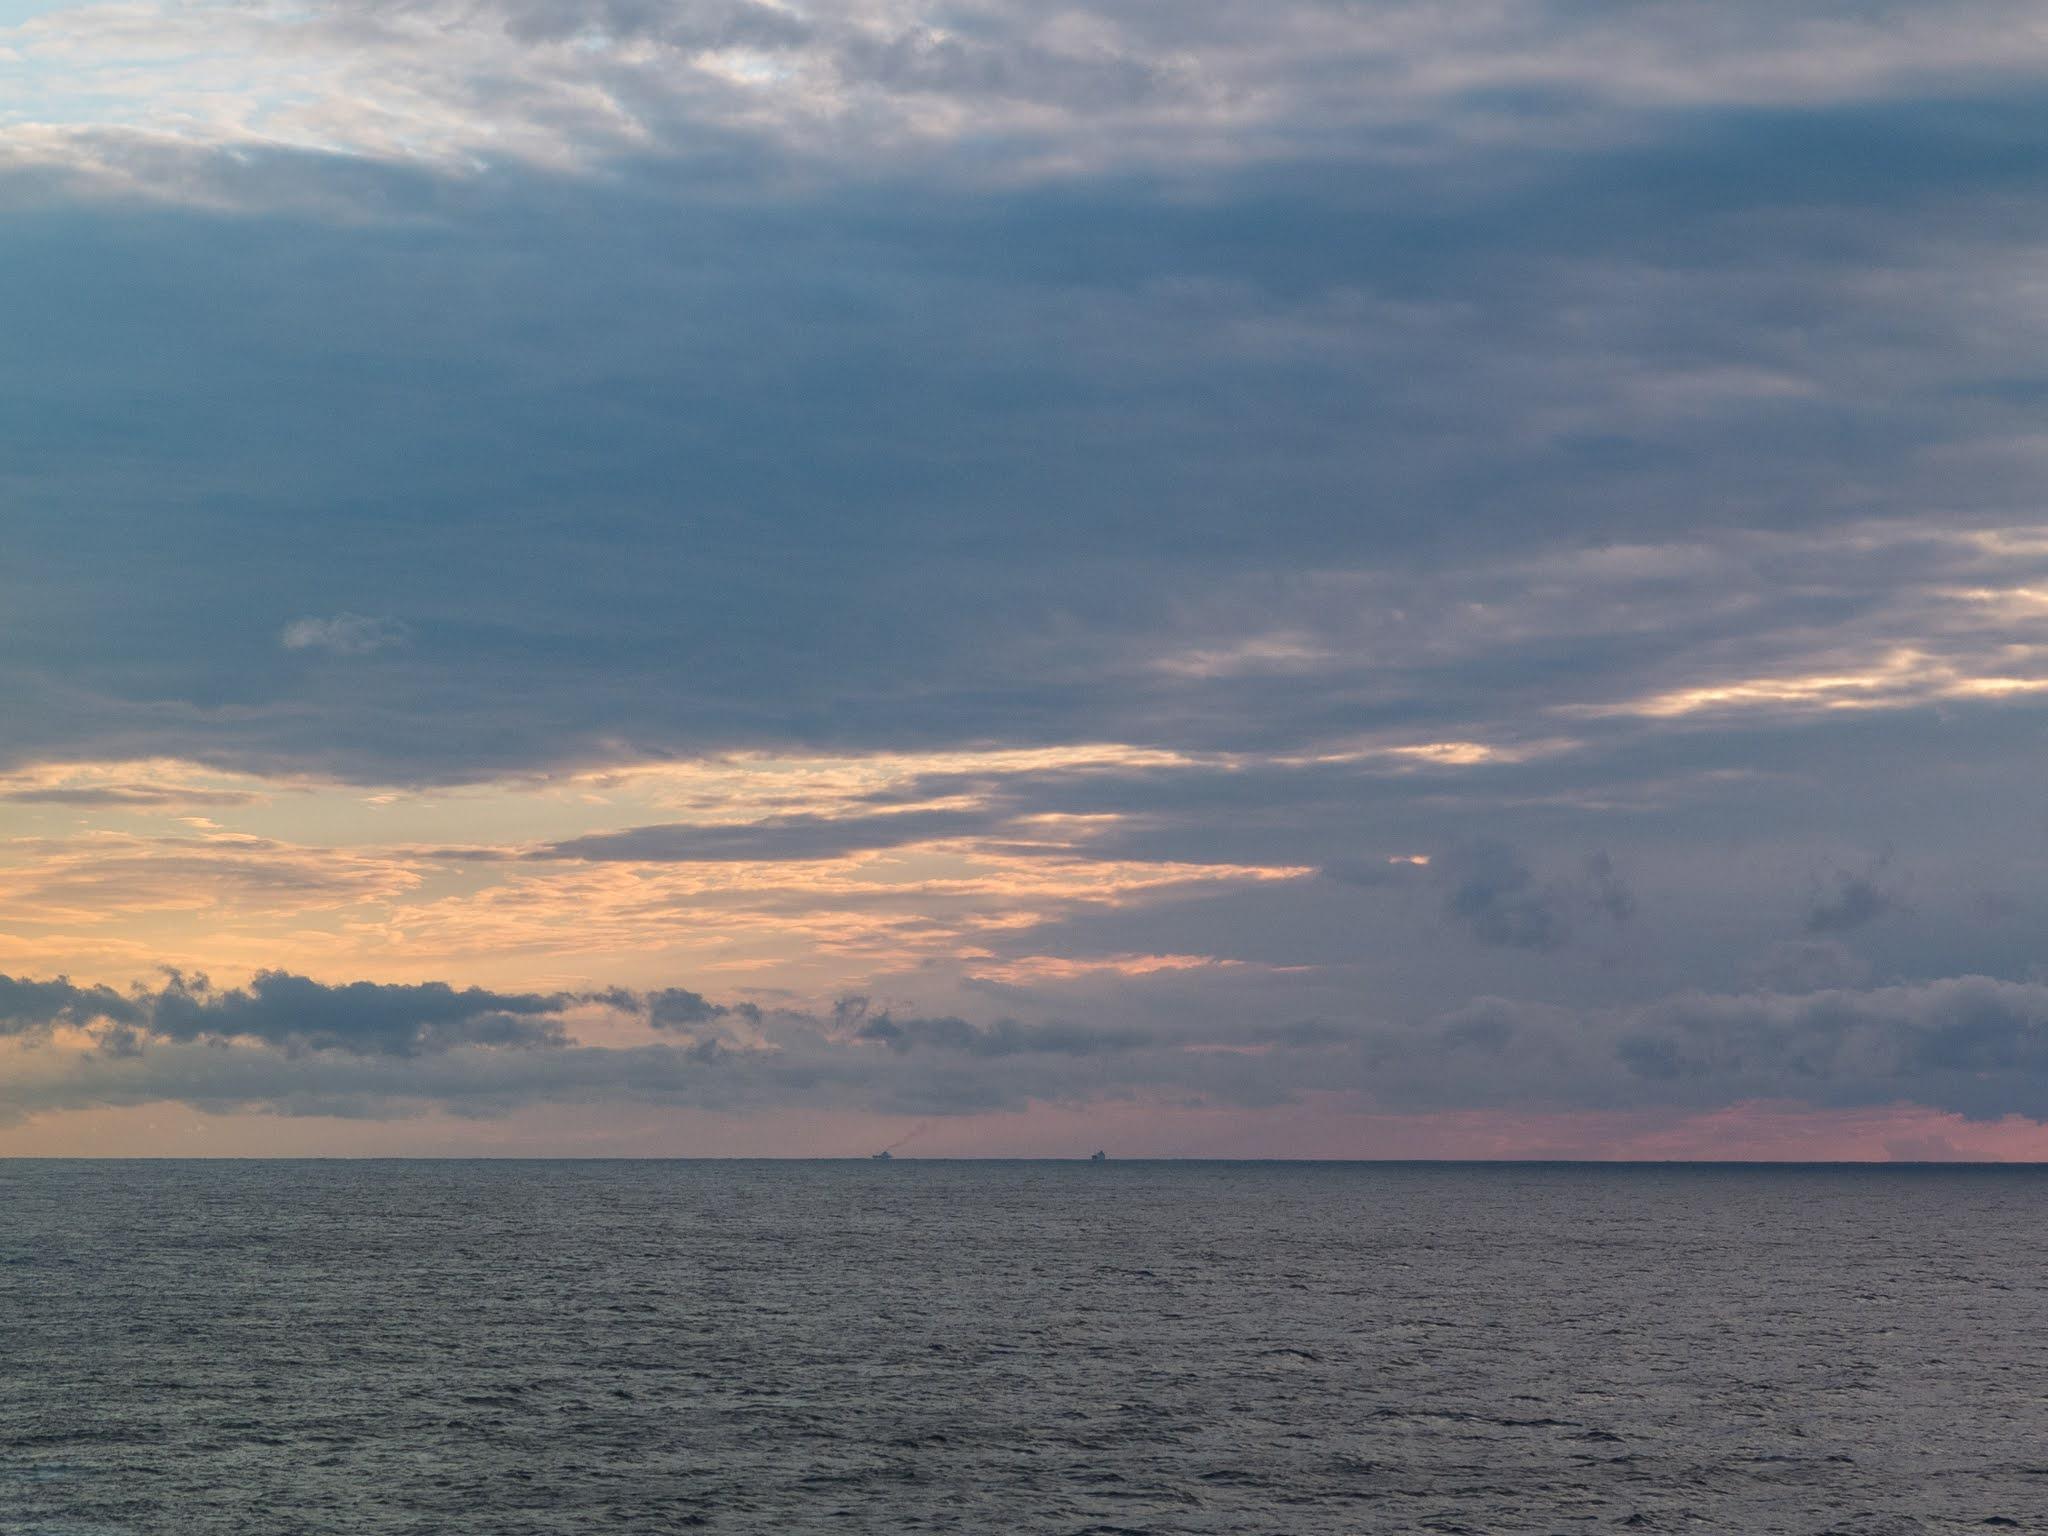 Sunset sky over the Balearic Sea.